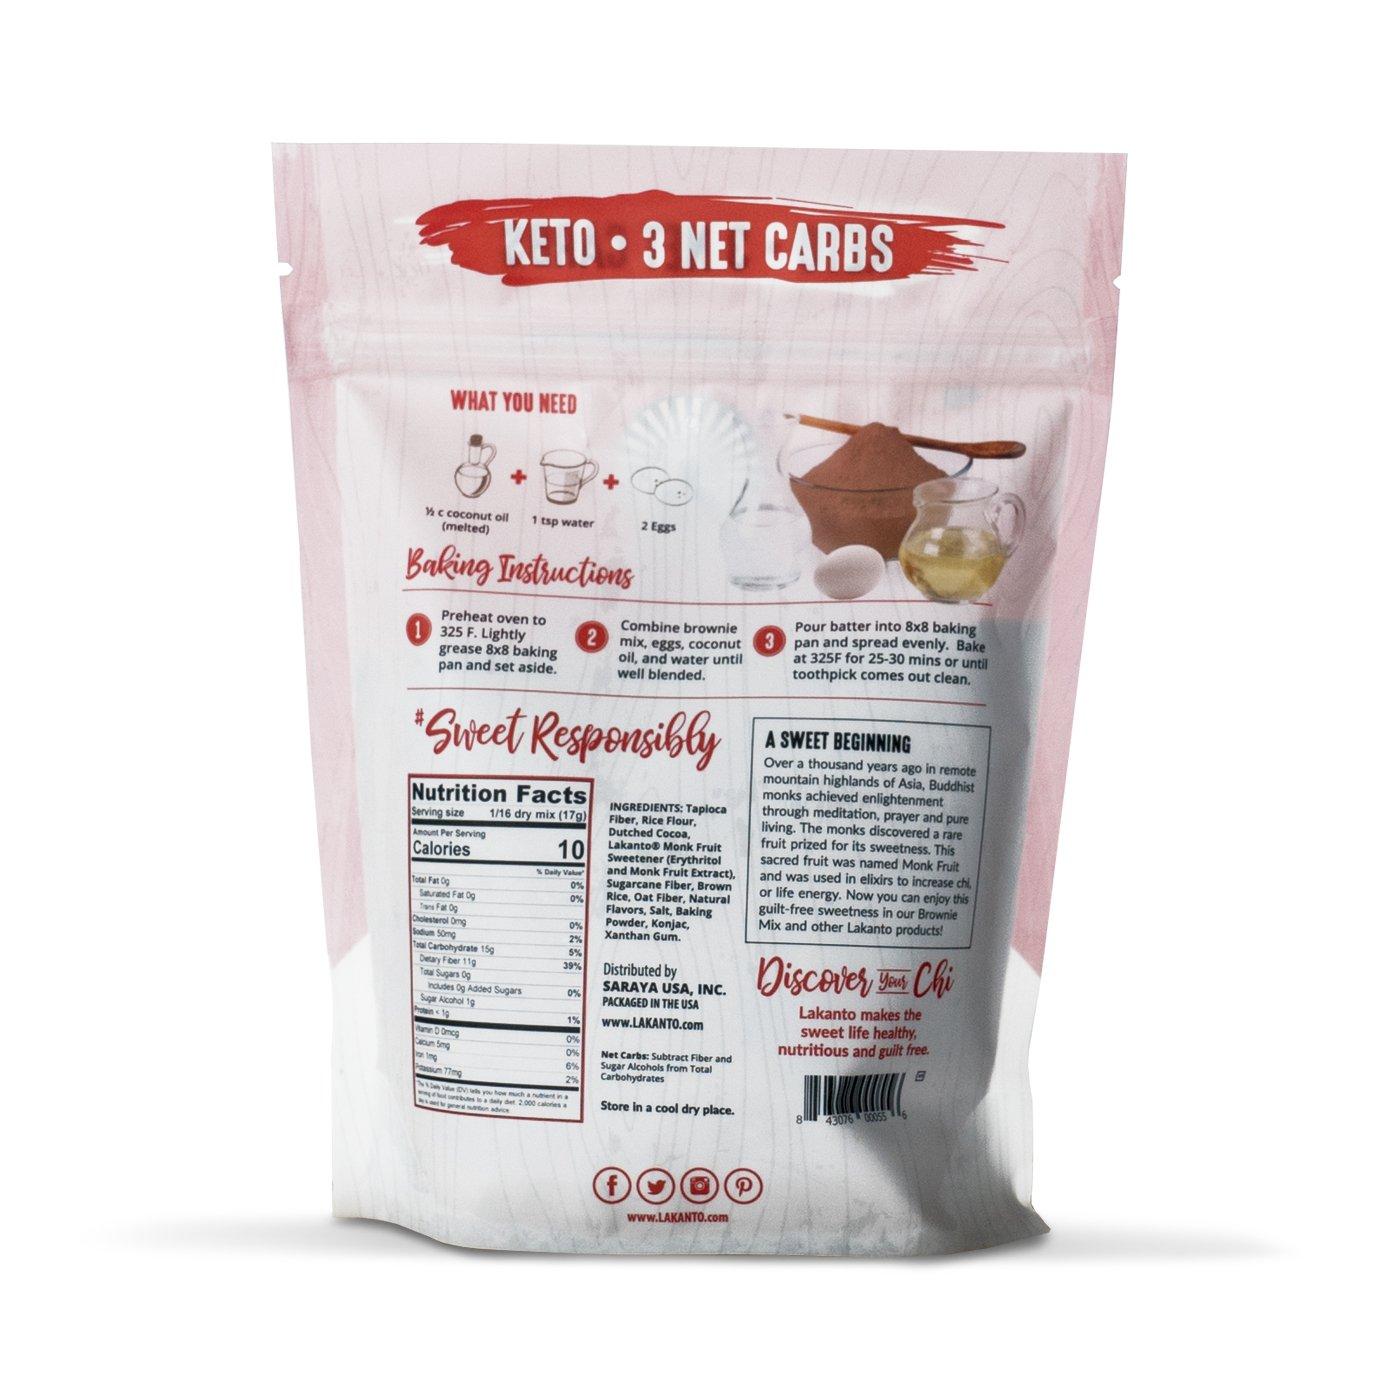 Lakanto Sugar-Free Brownie Mix | 3 net carbs | (Gluten-Free, 16 Servings) by Lakanto (Image #2)